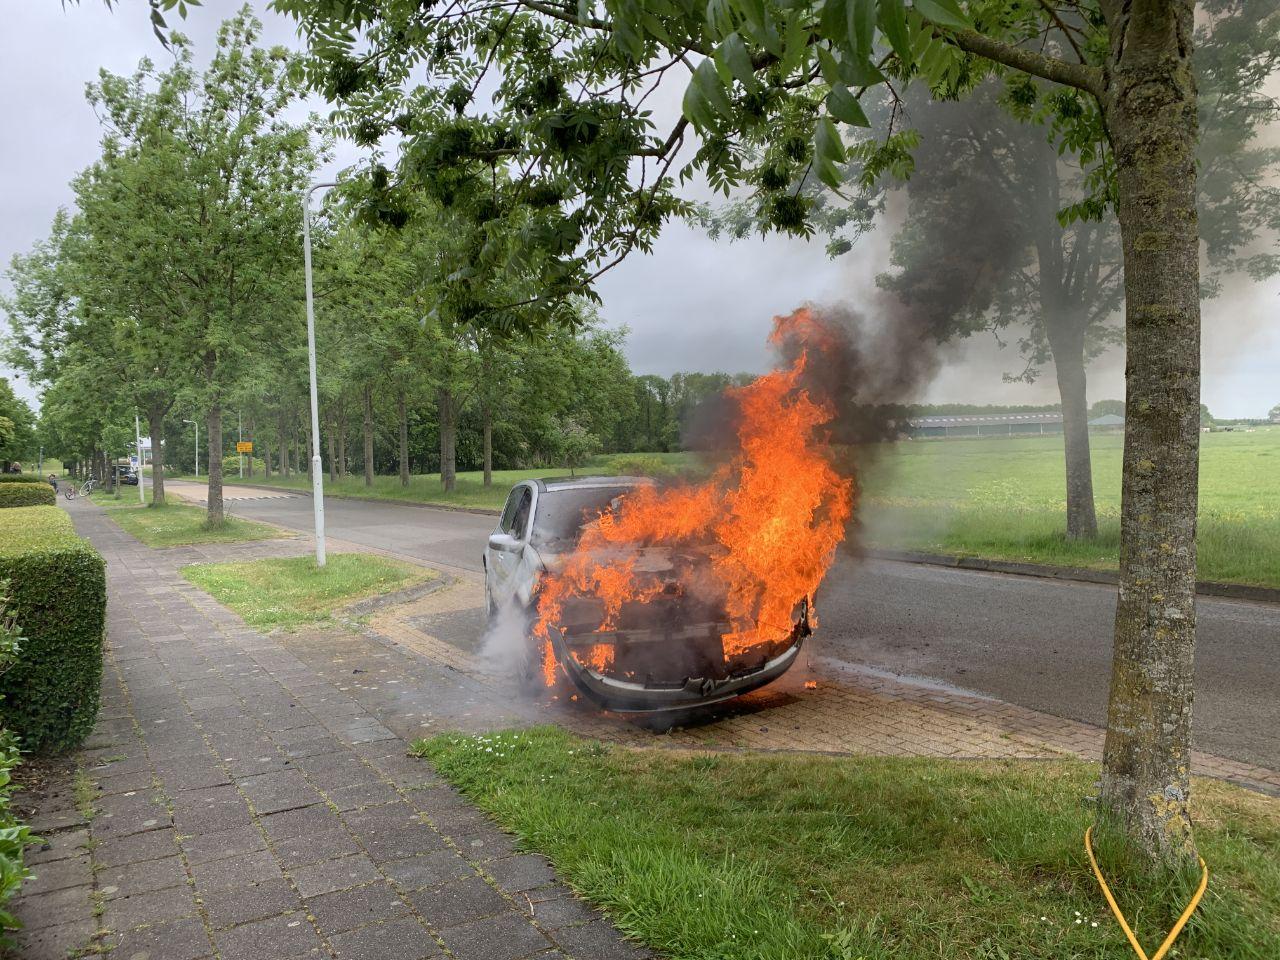 Felle auto brand aan de Skries in Dronryp